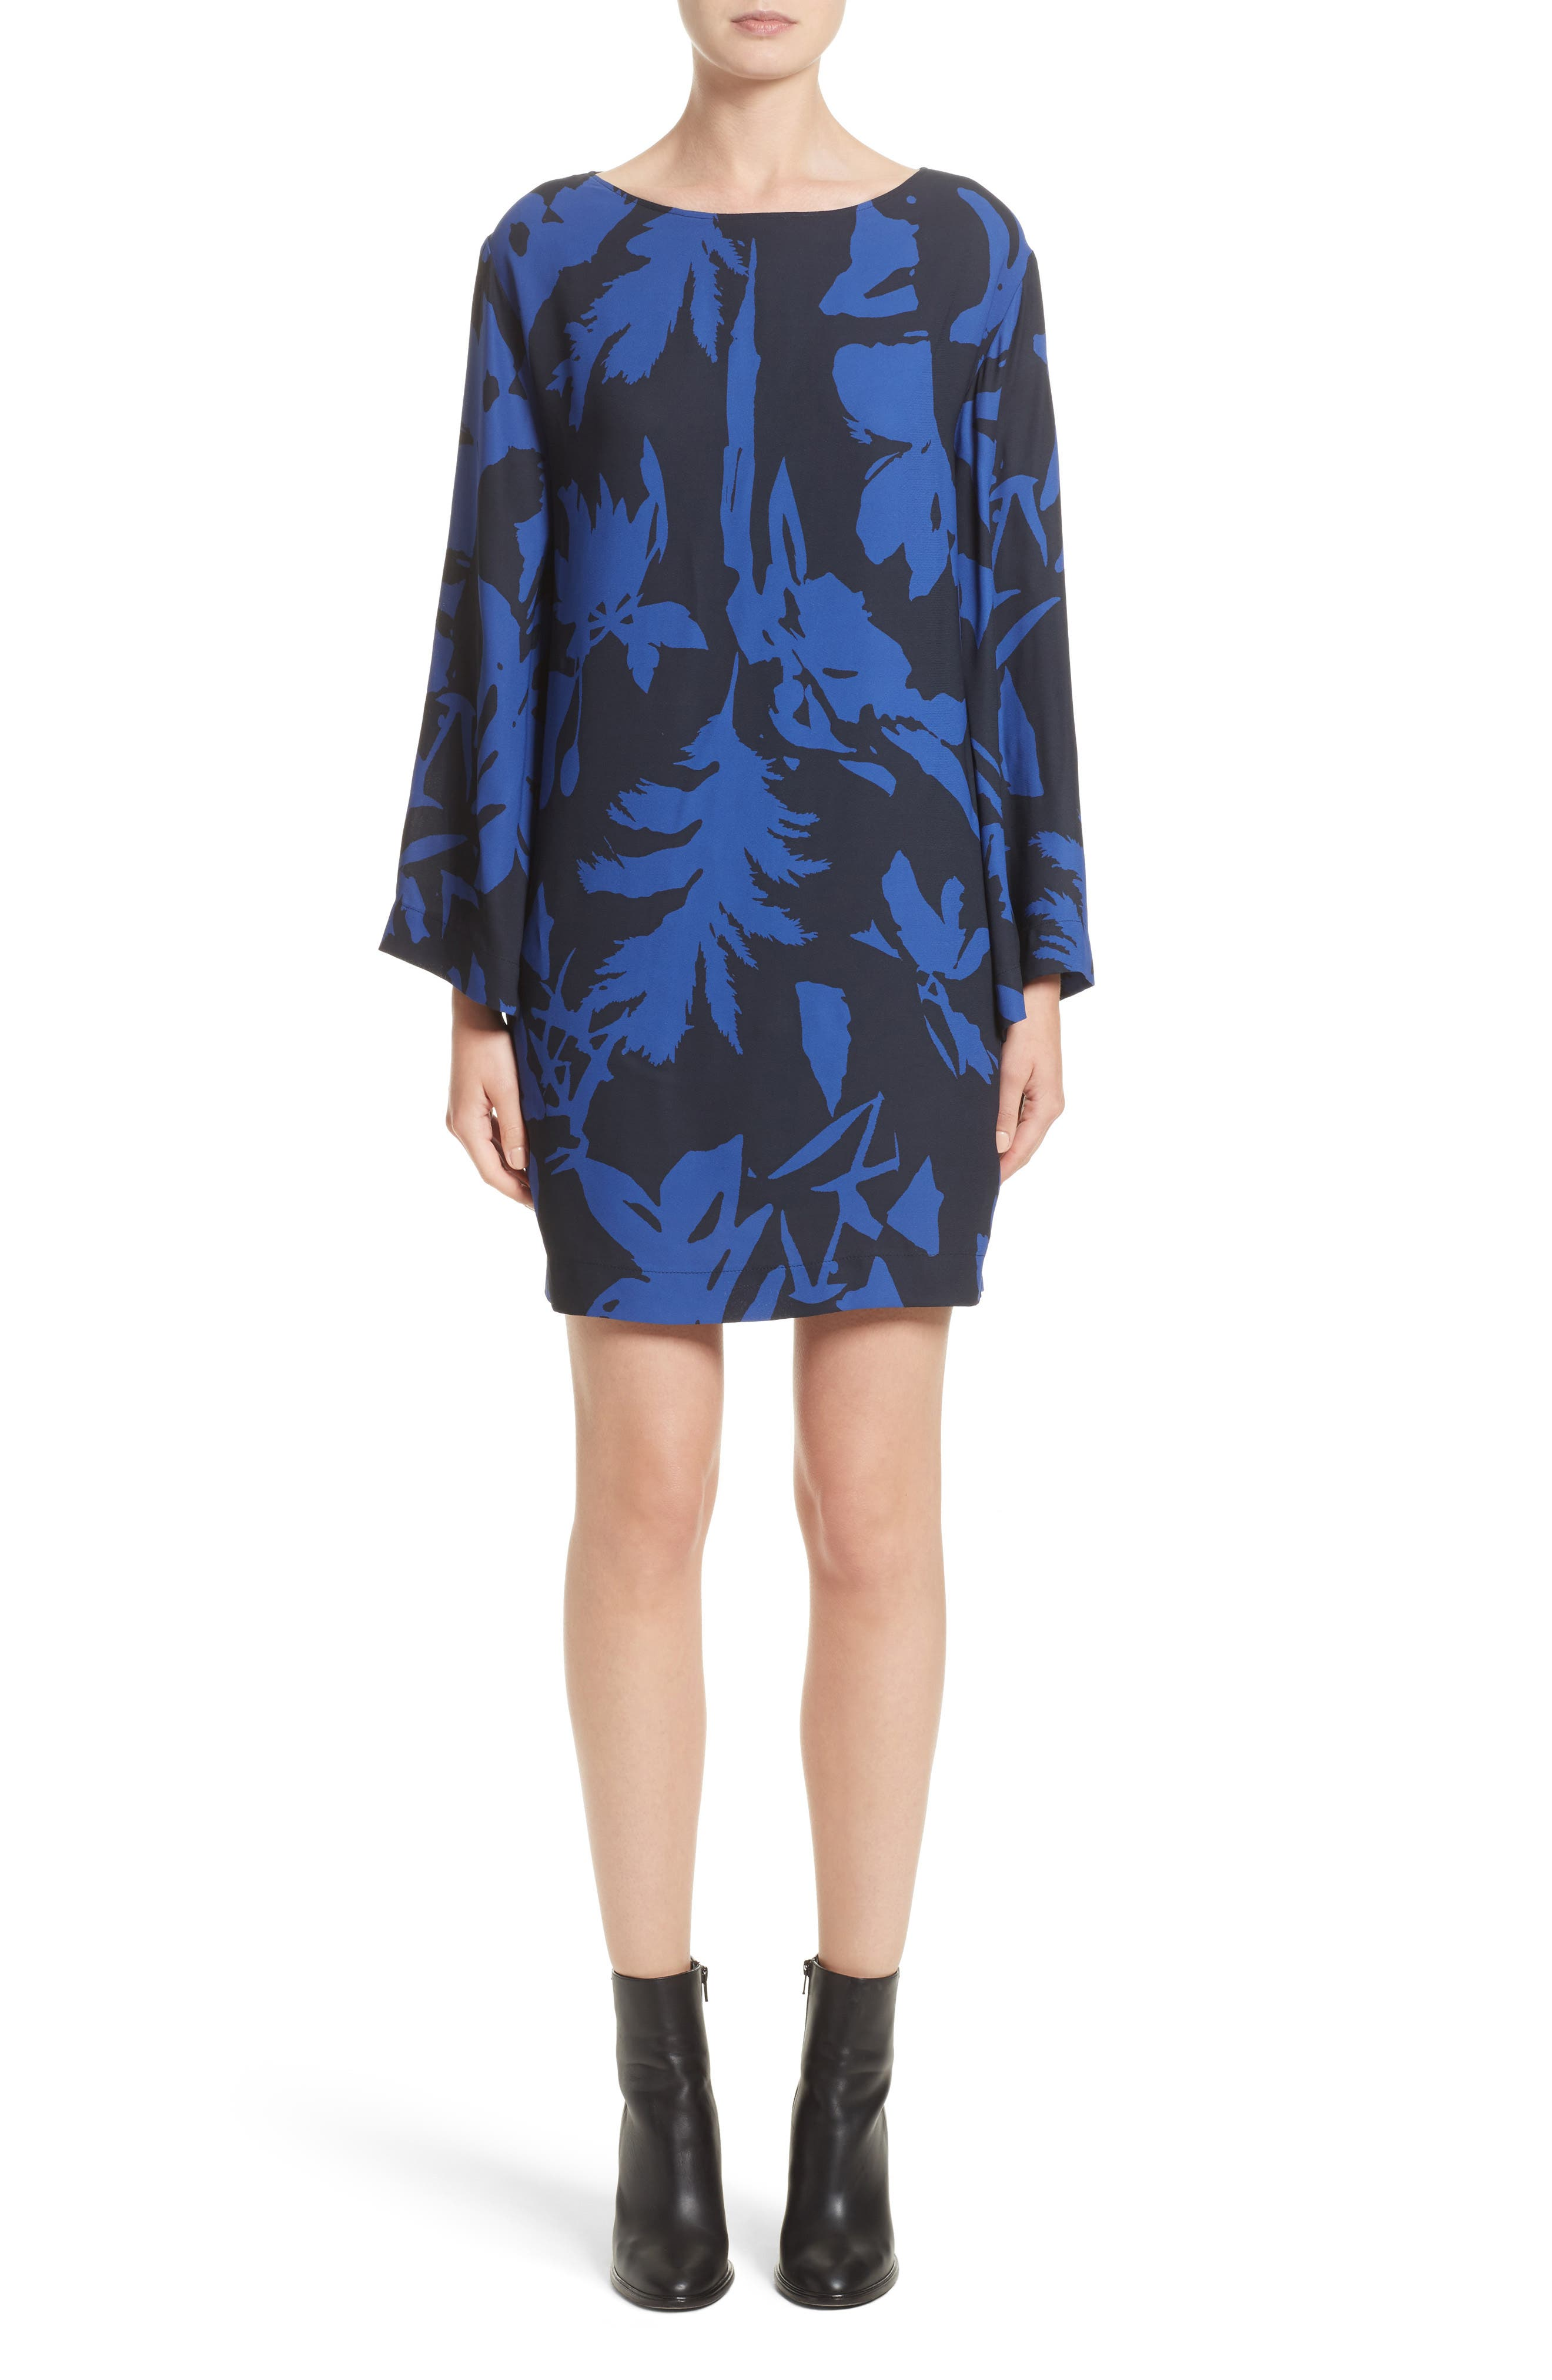 Main Image - Fuzzi Floral Crepe Bell Sleeve Dress